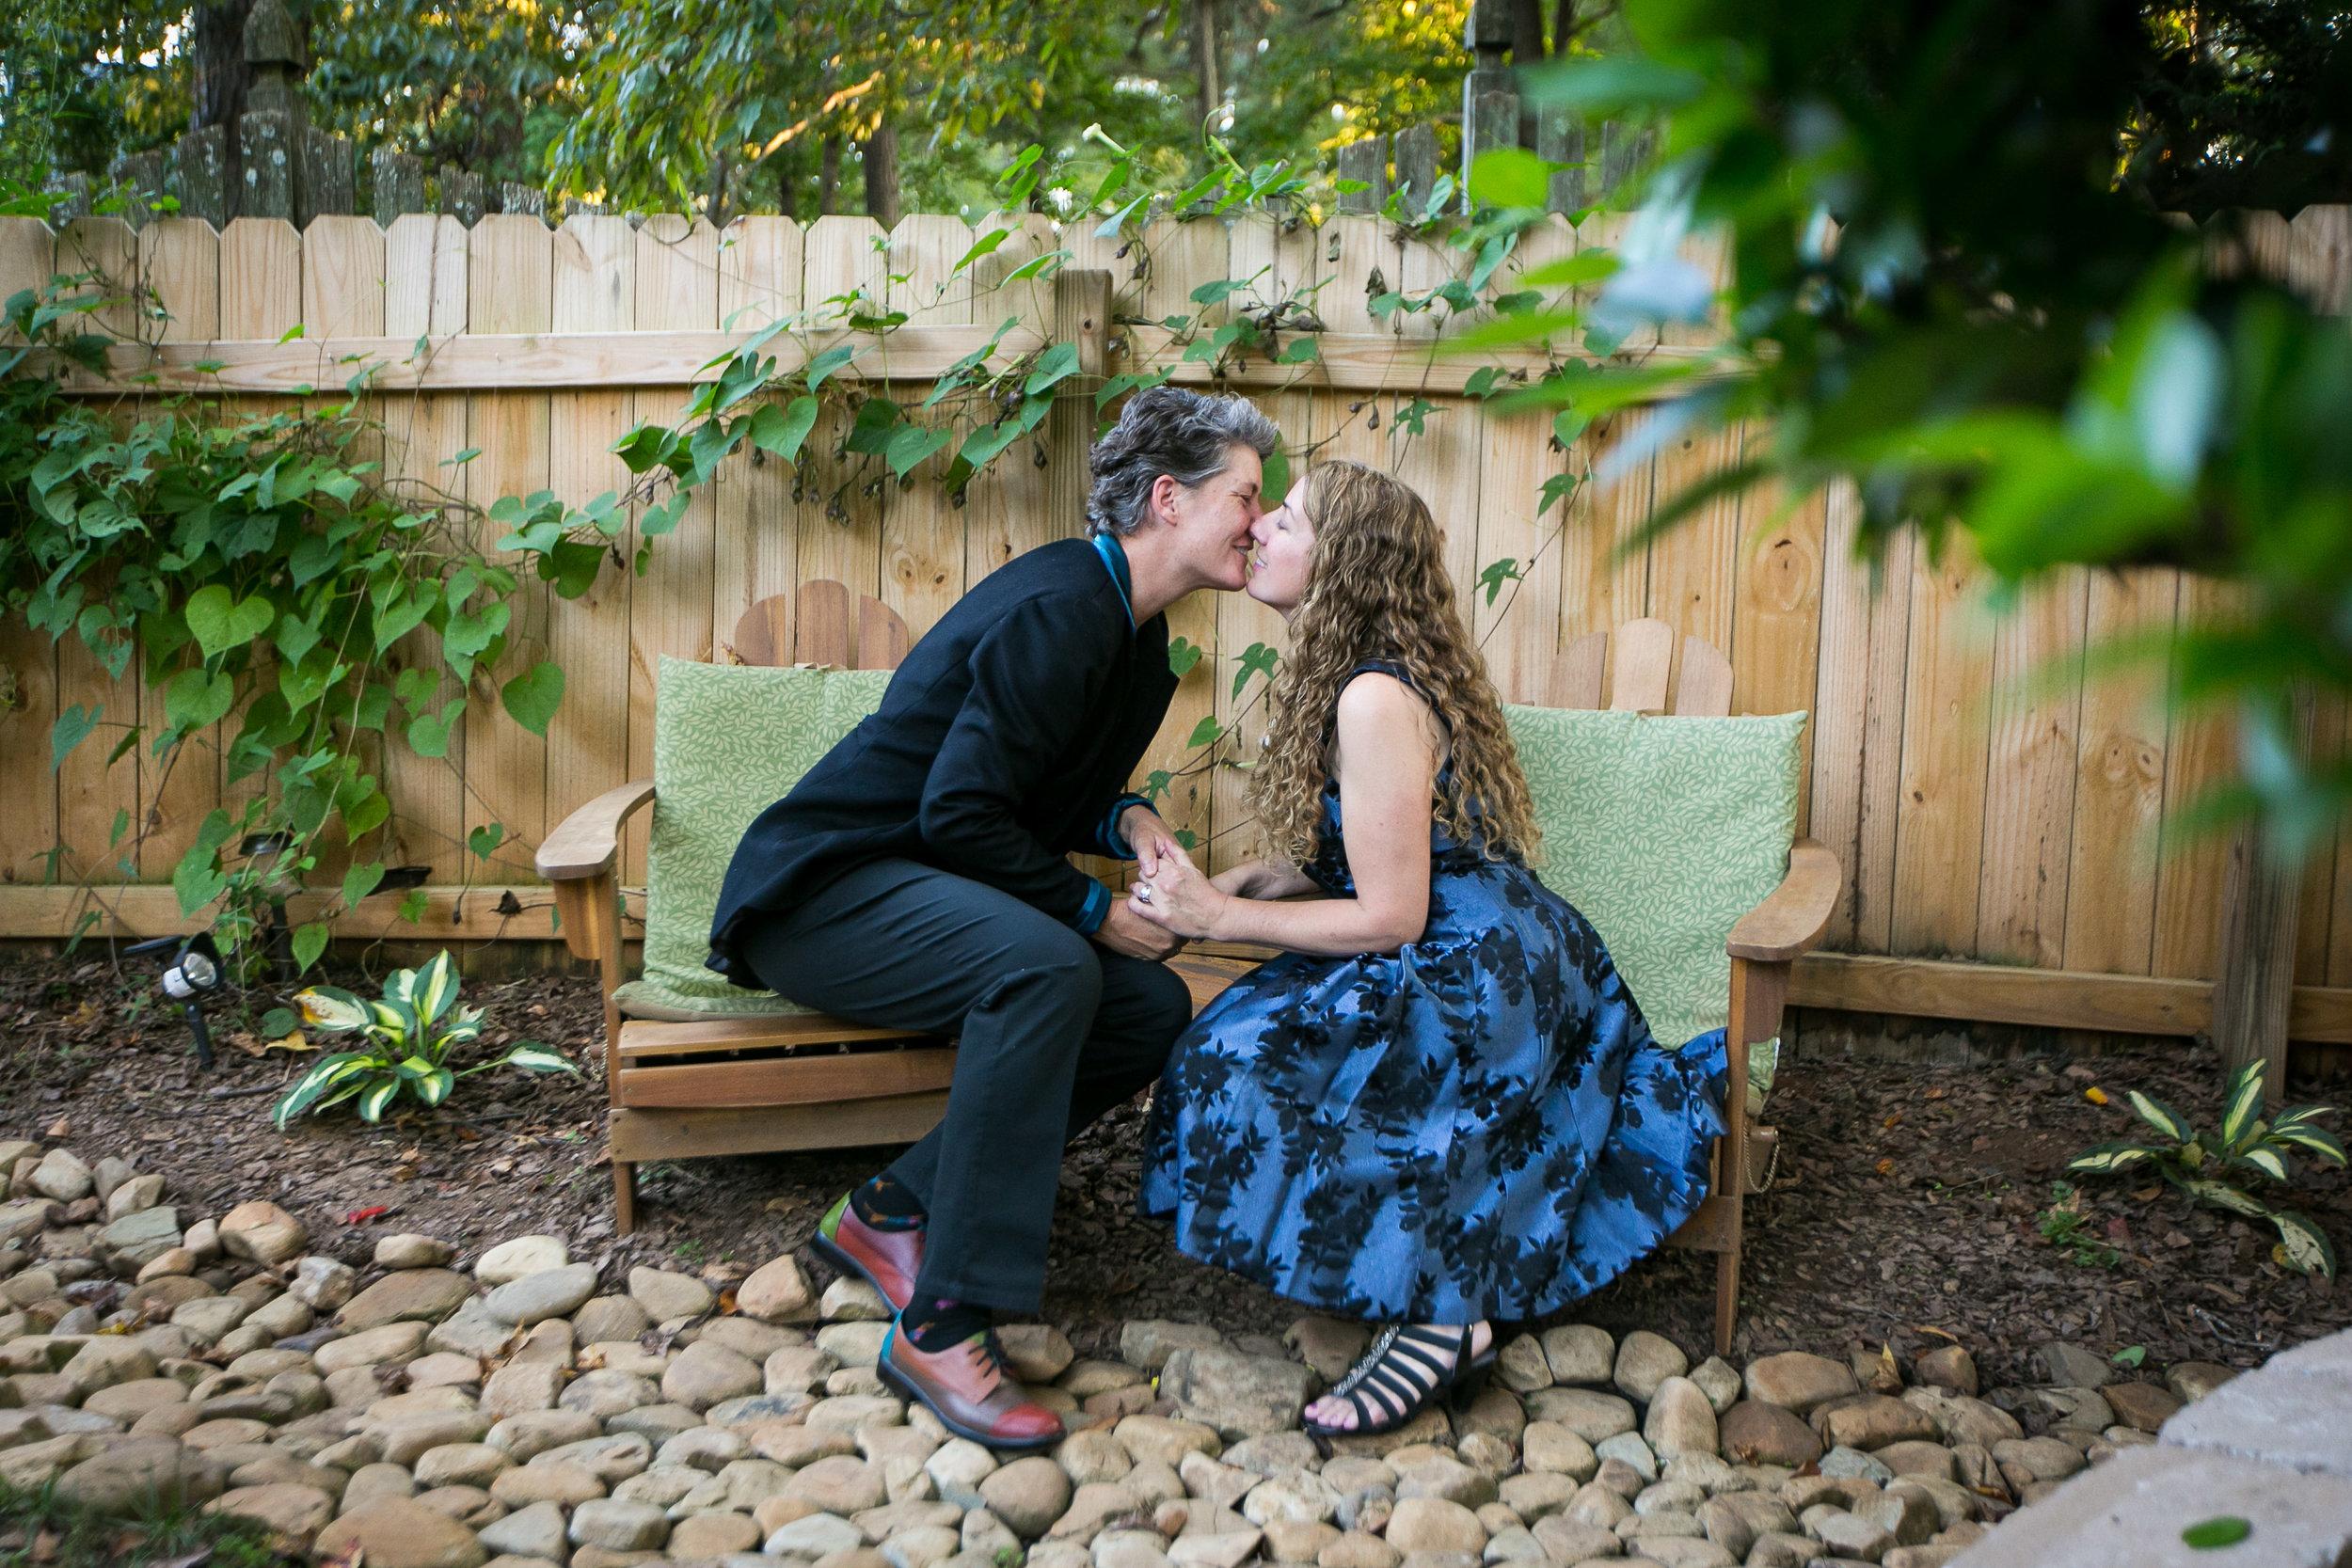 Cathy and Lori's backyard wedding in Alpharetta